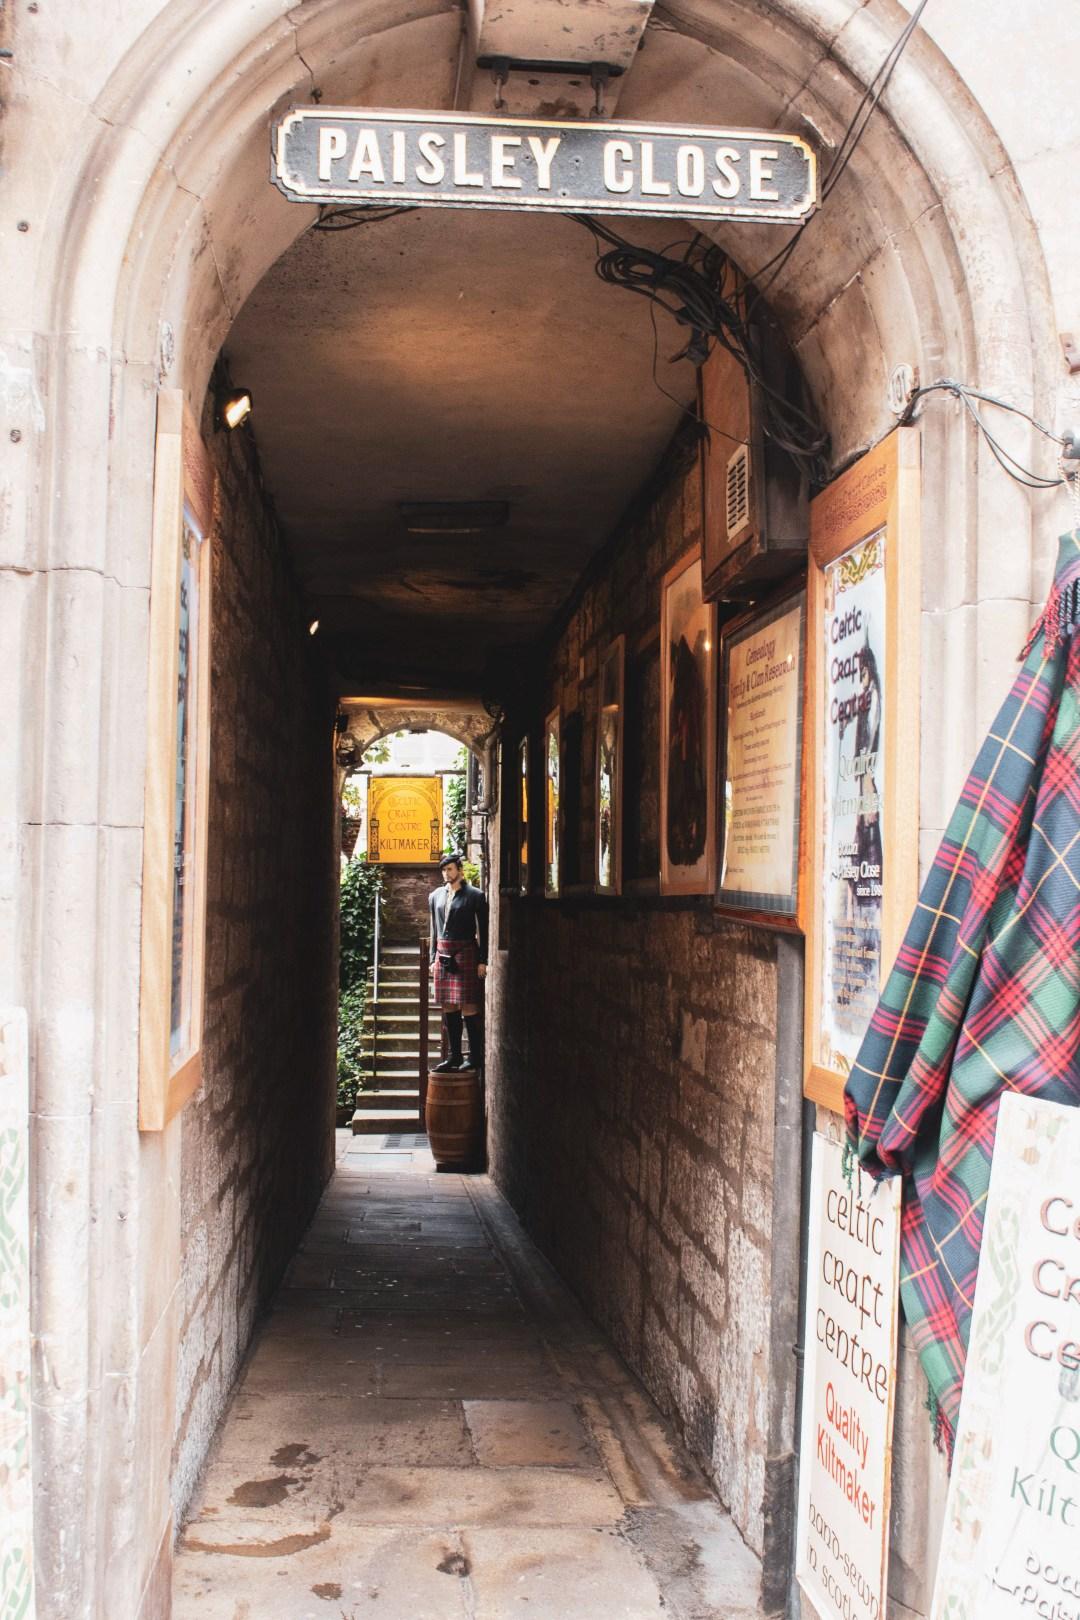 Paisley Close narrow walkway leading to dimly lit courtyard